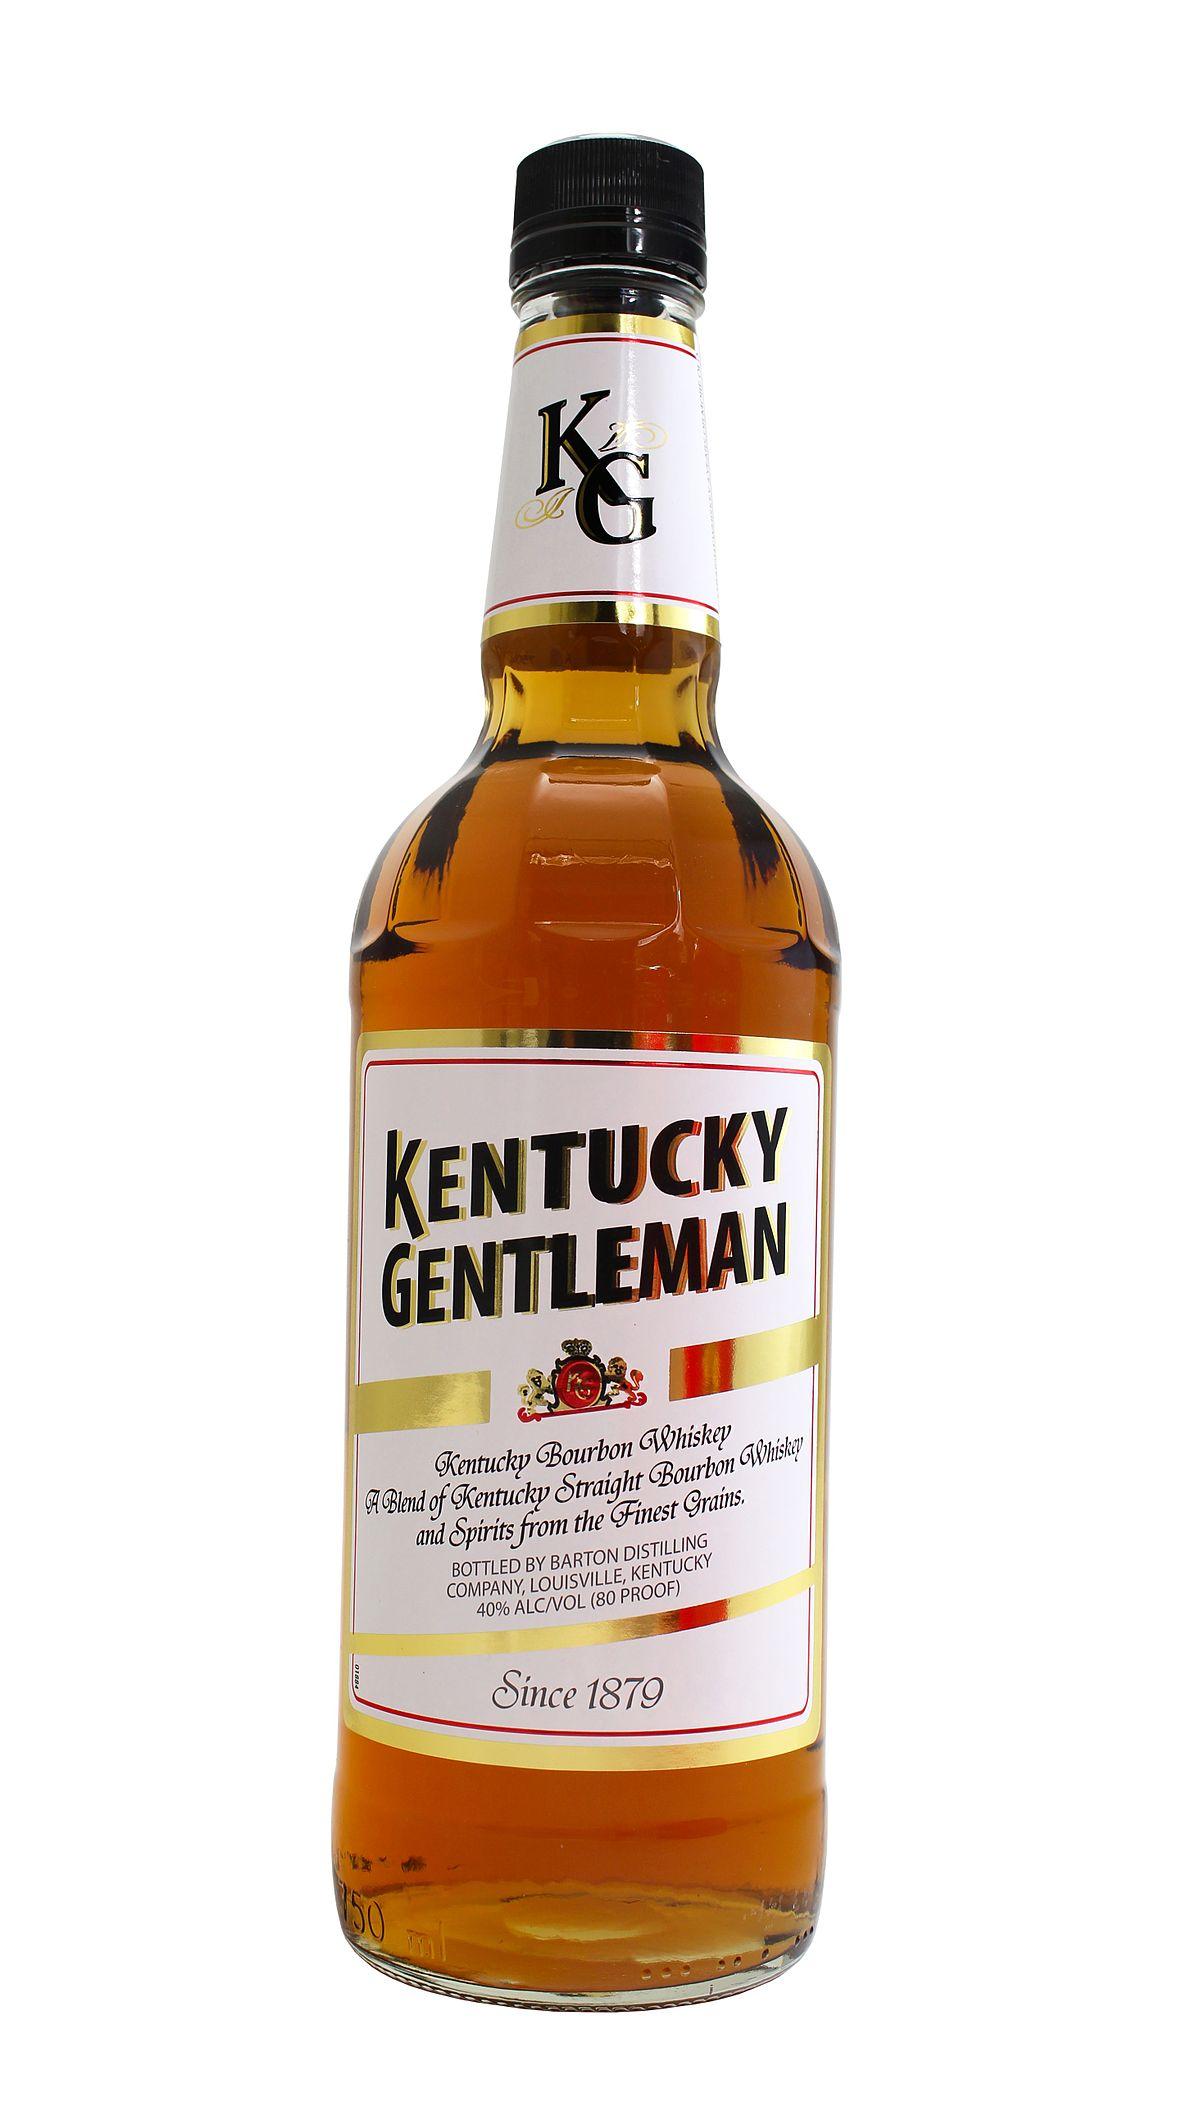 Kentucky Gentleman Wikipedia